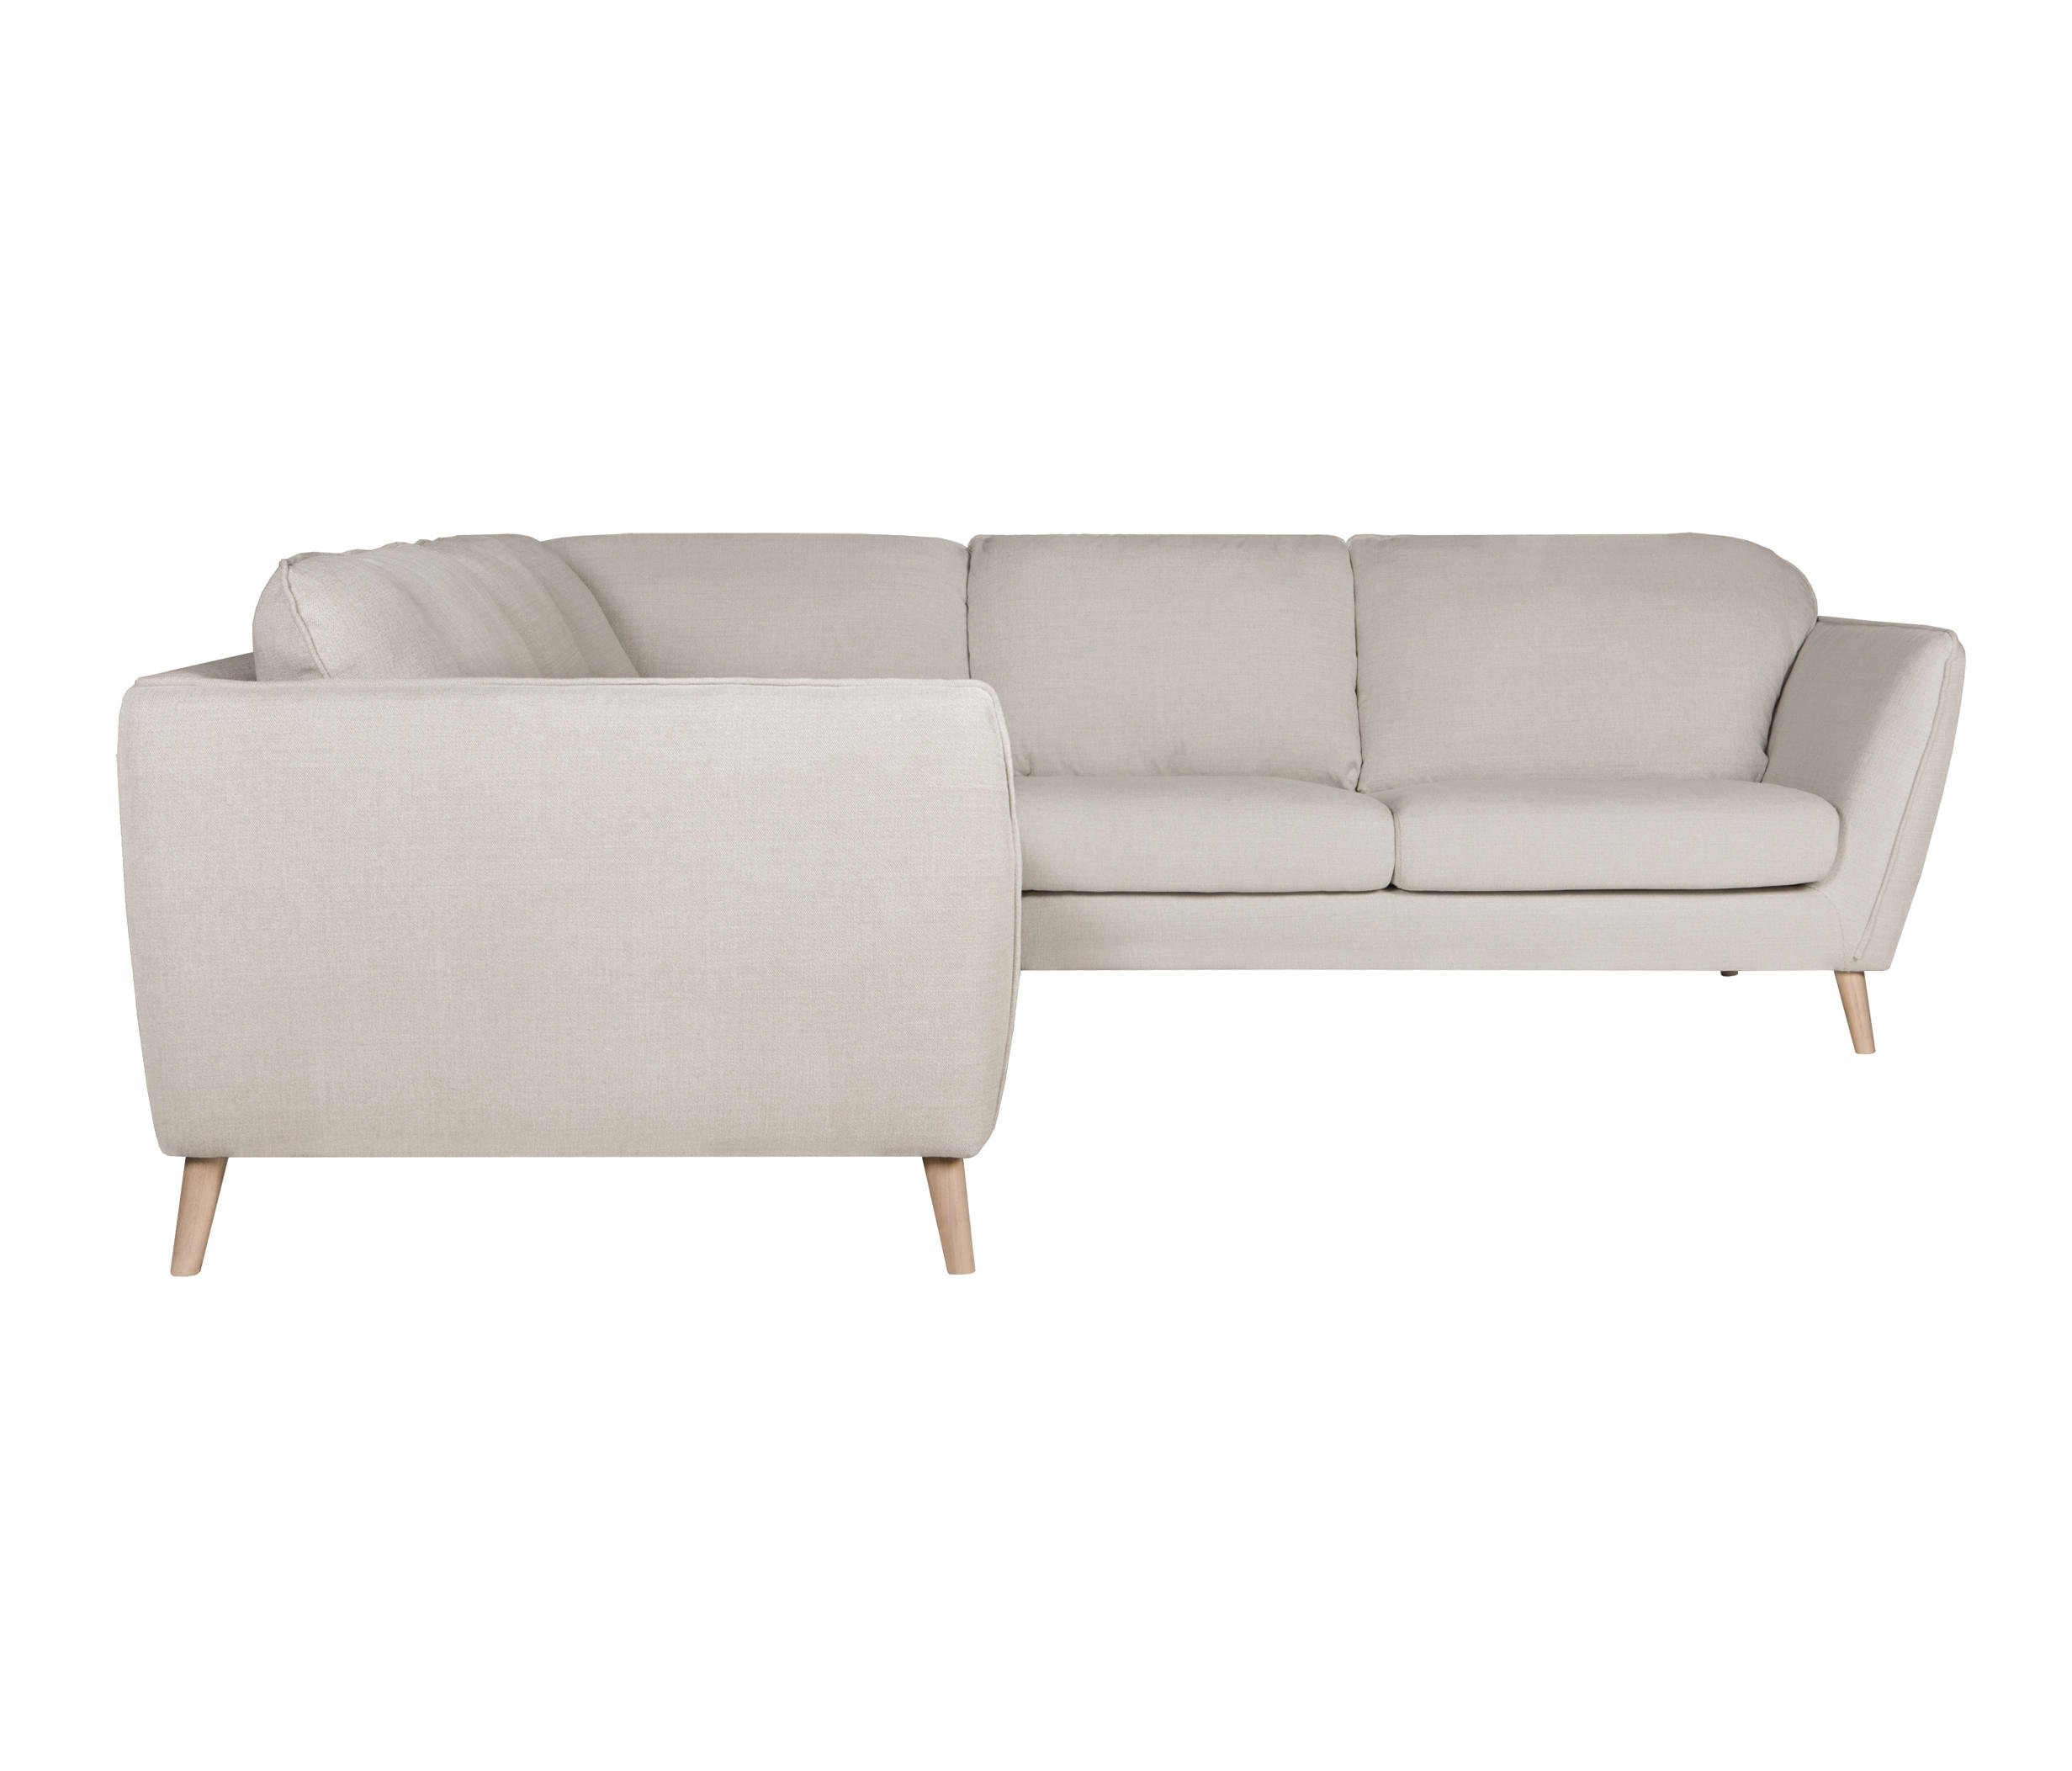 Stella By SITS | Sofas Stella By SITS | Sofas ...